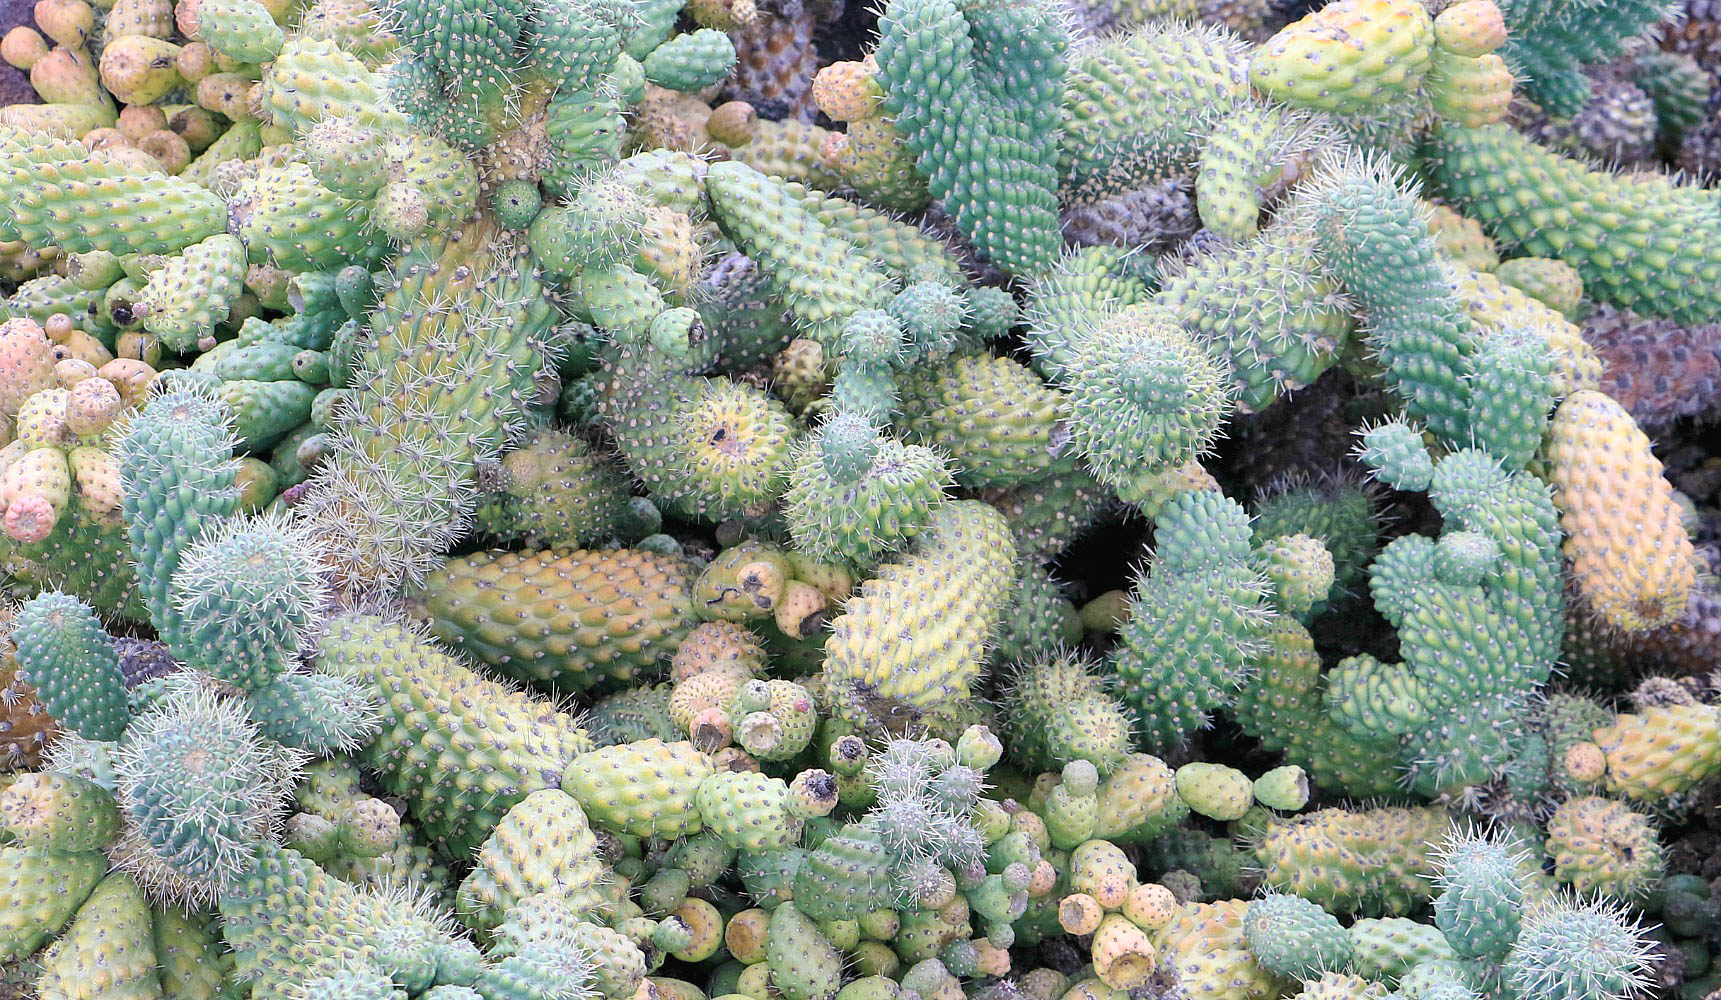 The magnificent jard n de cactus pod travels for Jardines con cactus